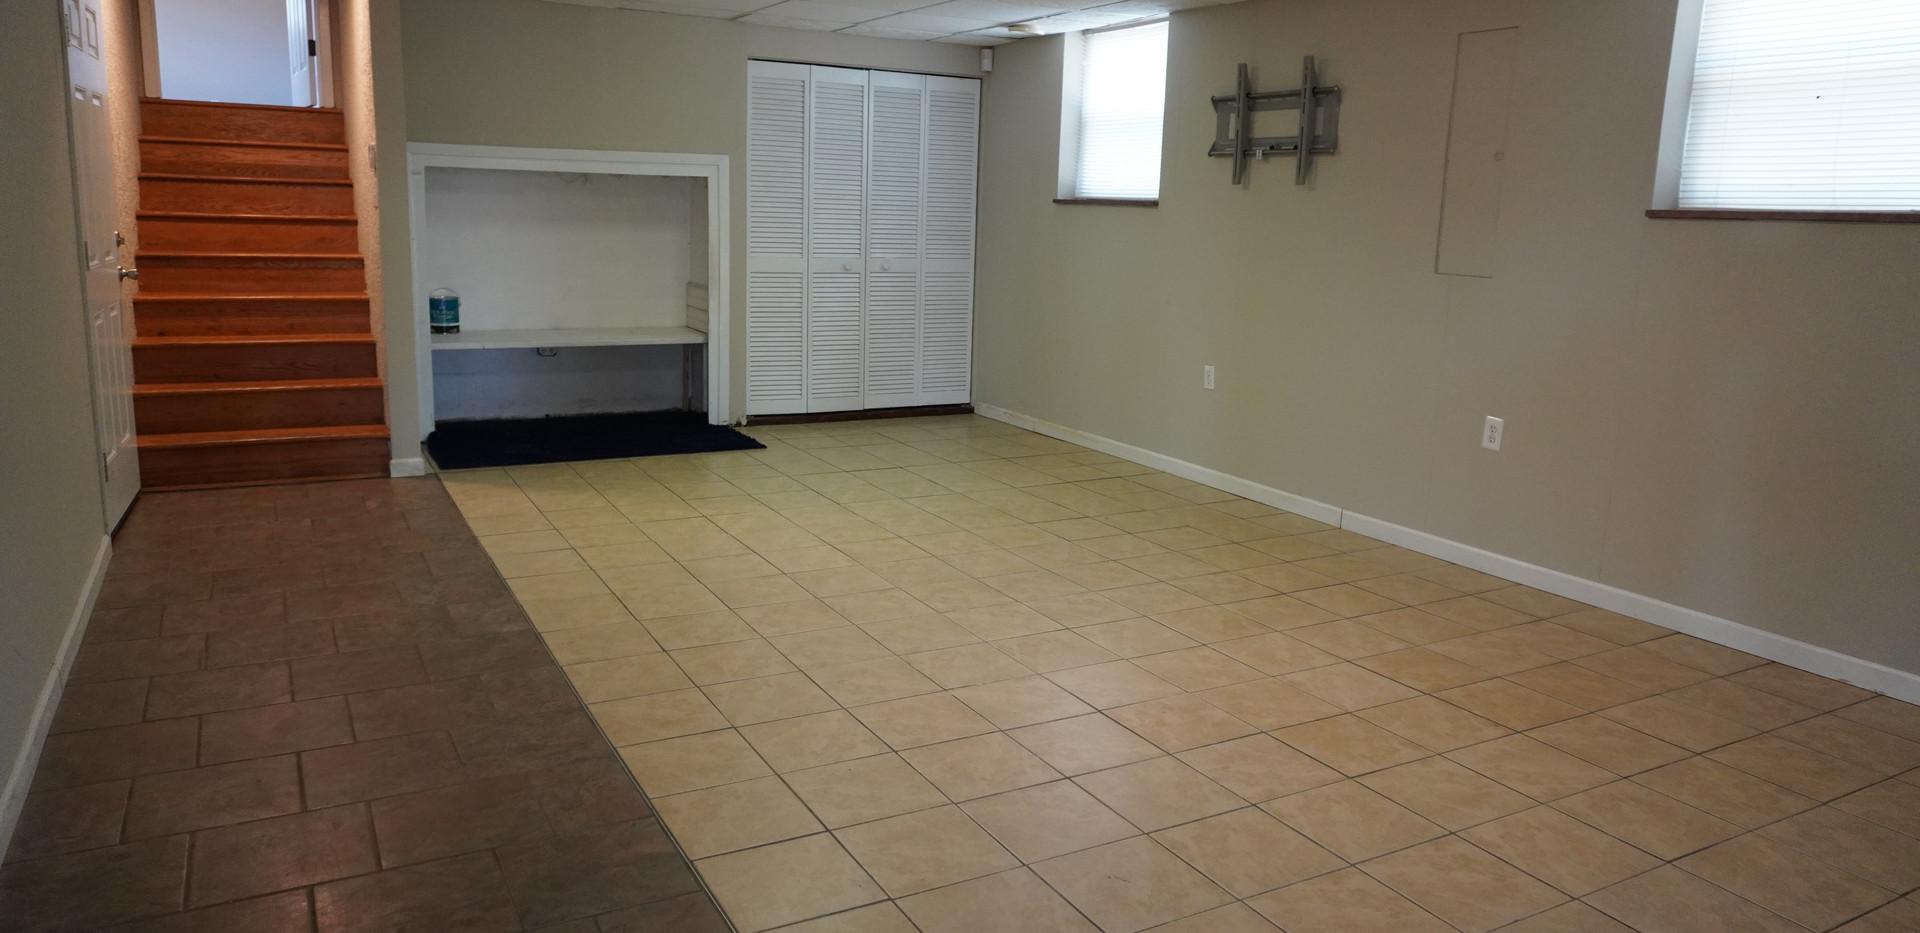 Basement Bonus Living Space